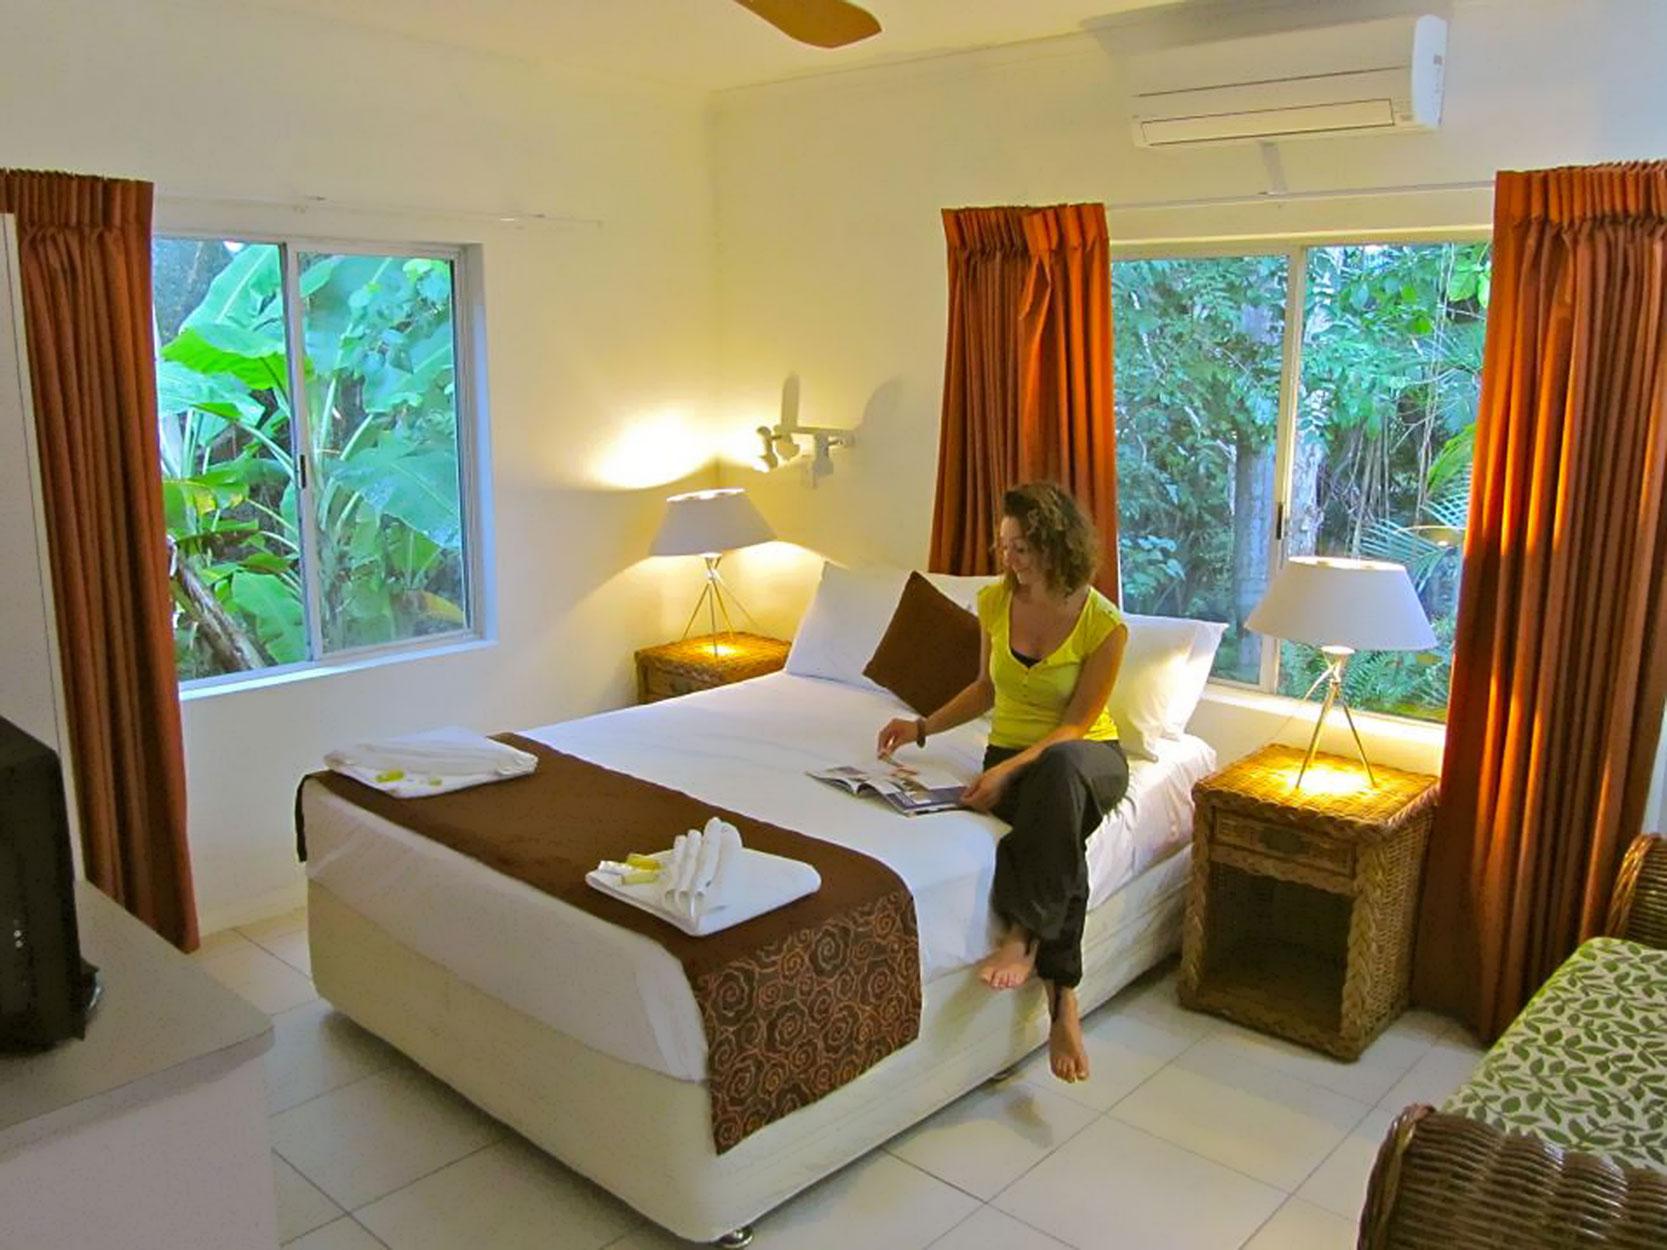 Villa Marine Honeymoon Apartment - Romantic Honeymoon Accommodation Cairns